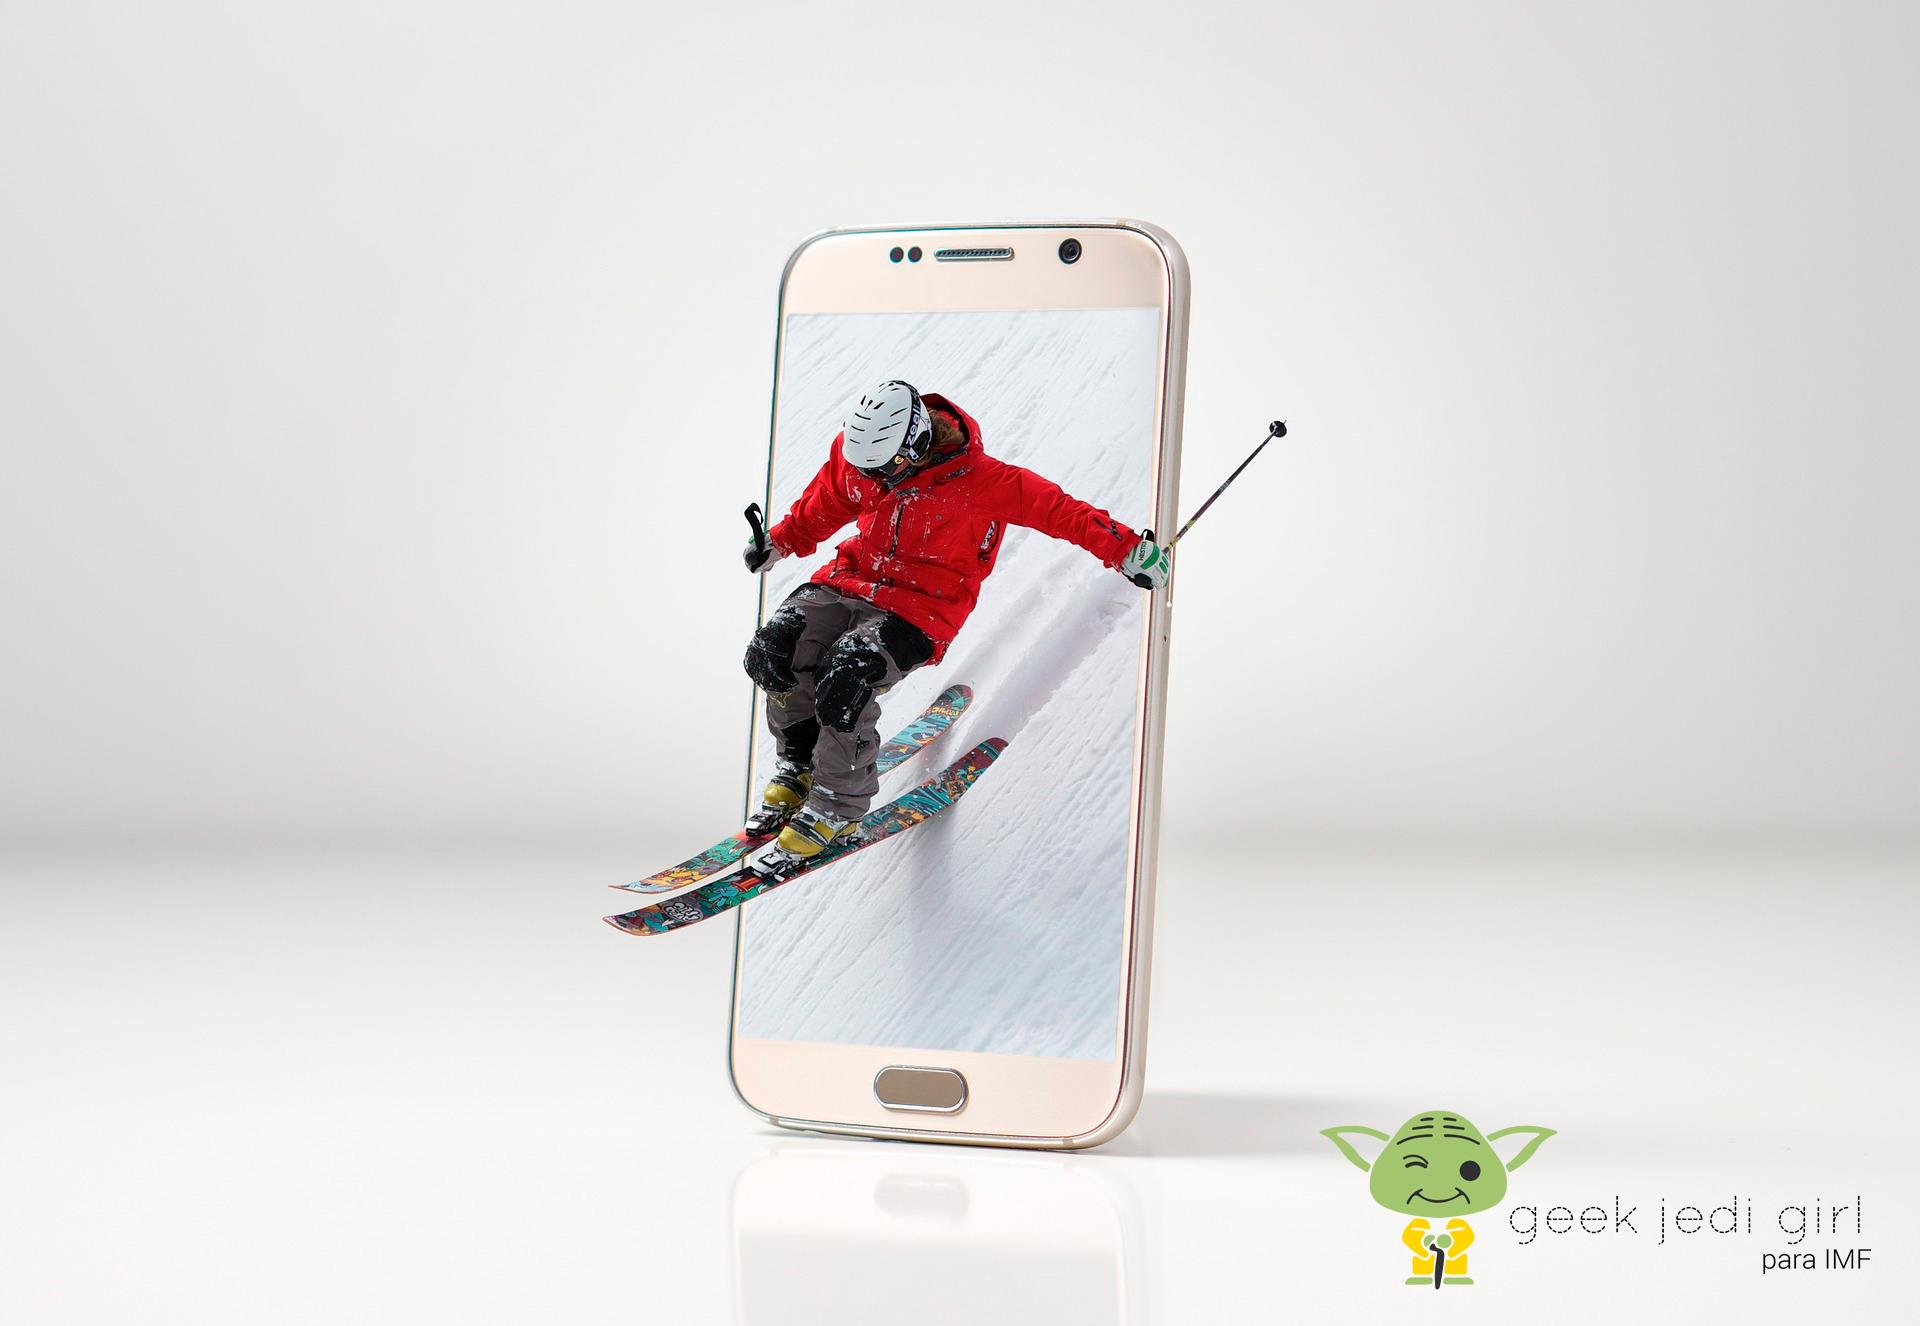 apps-esquiar Las mejores apps para esquiar